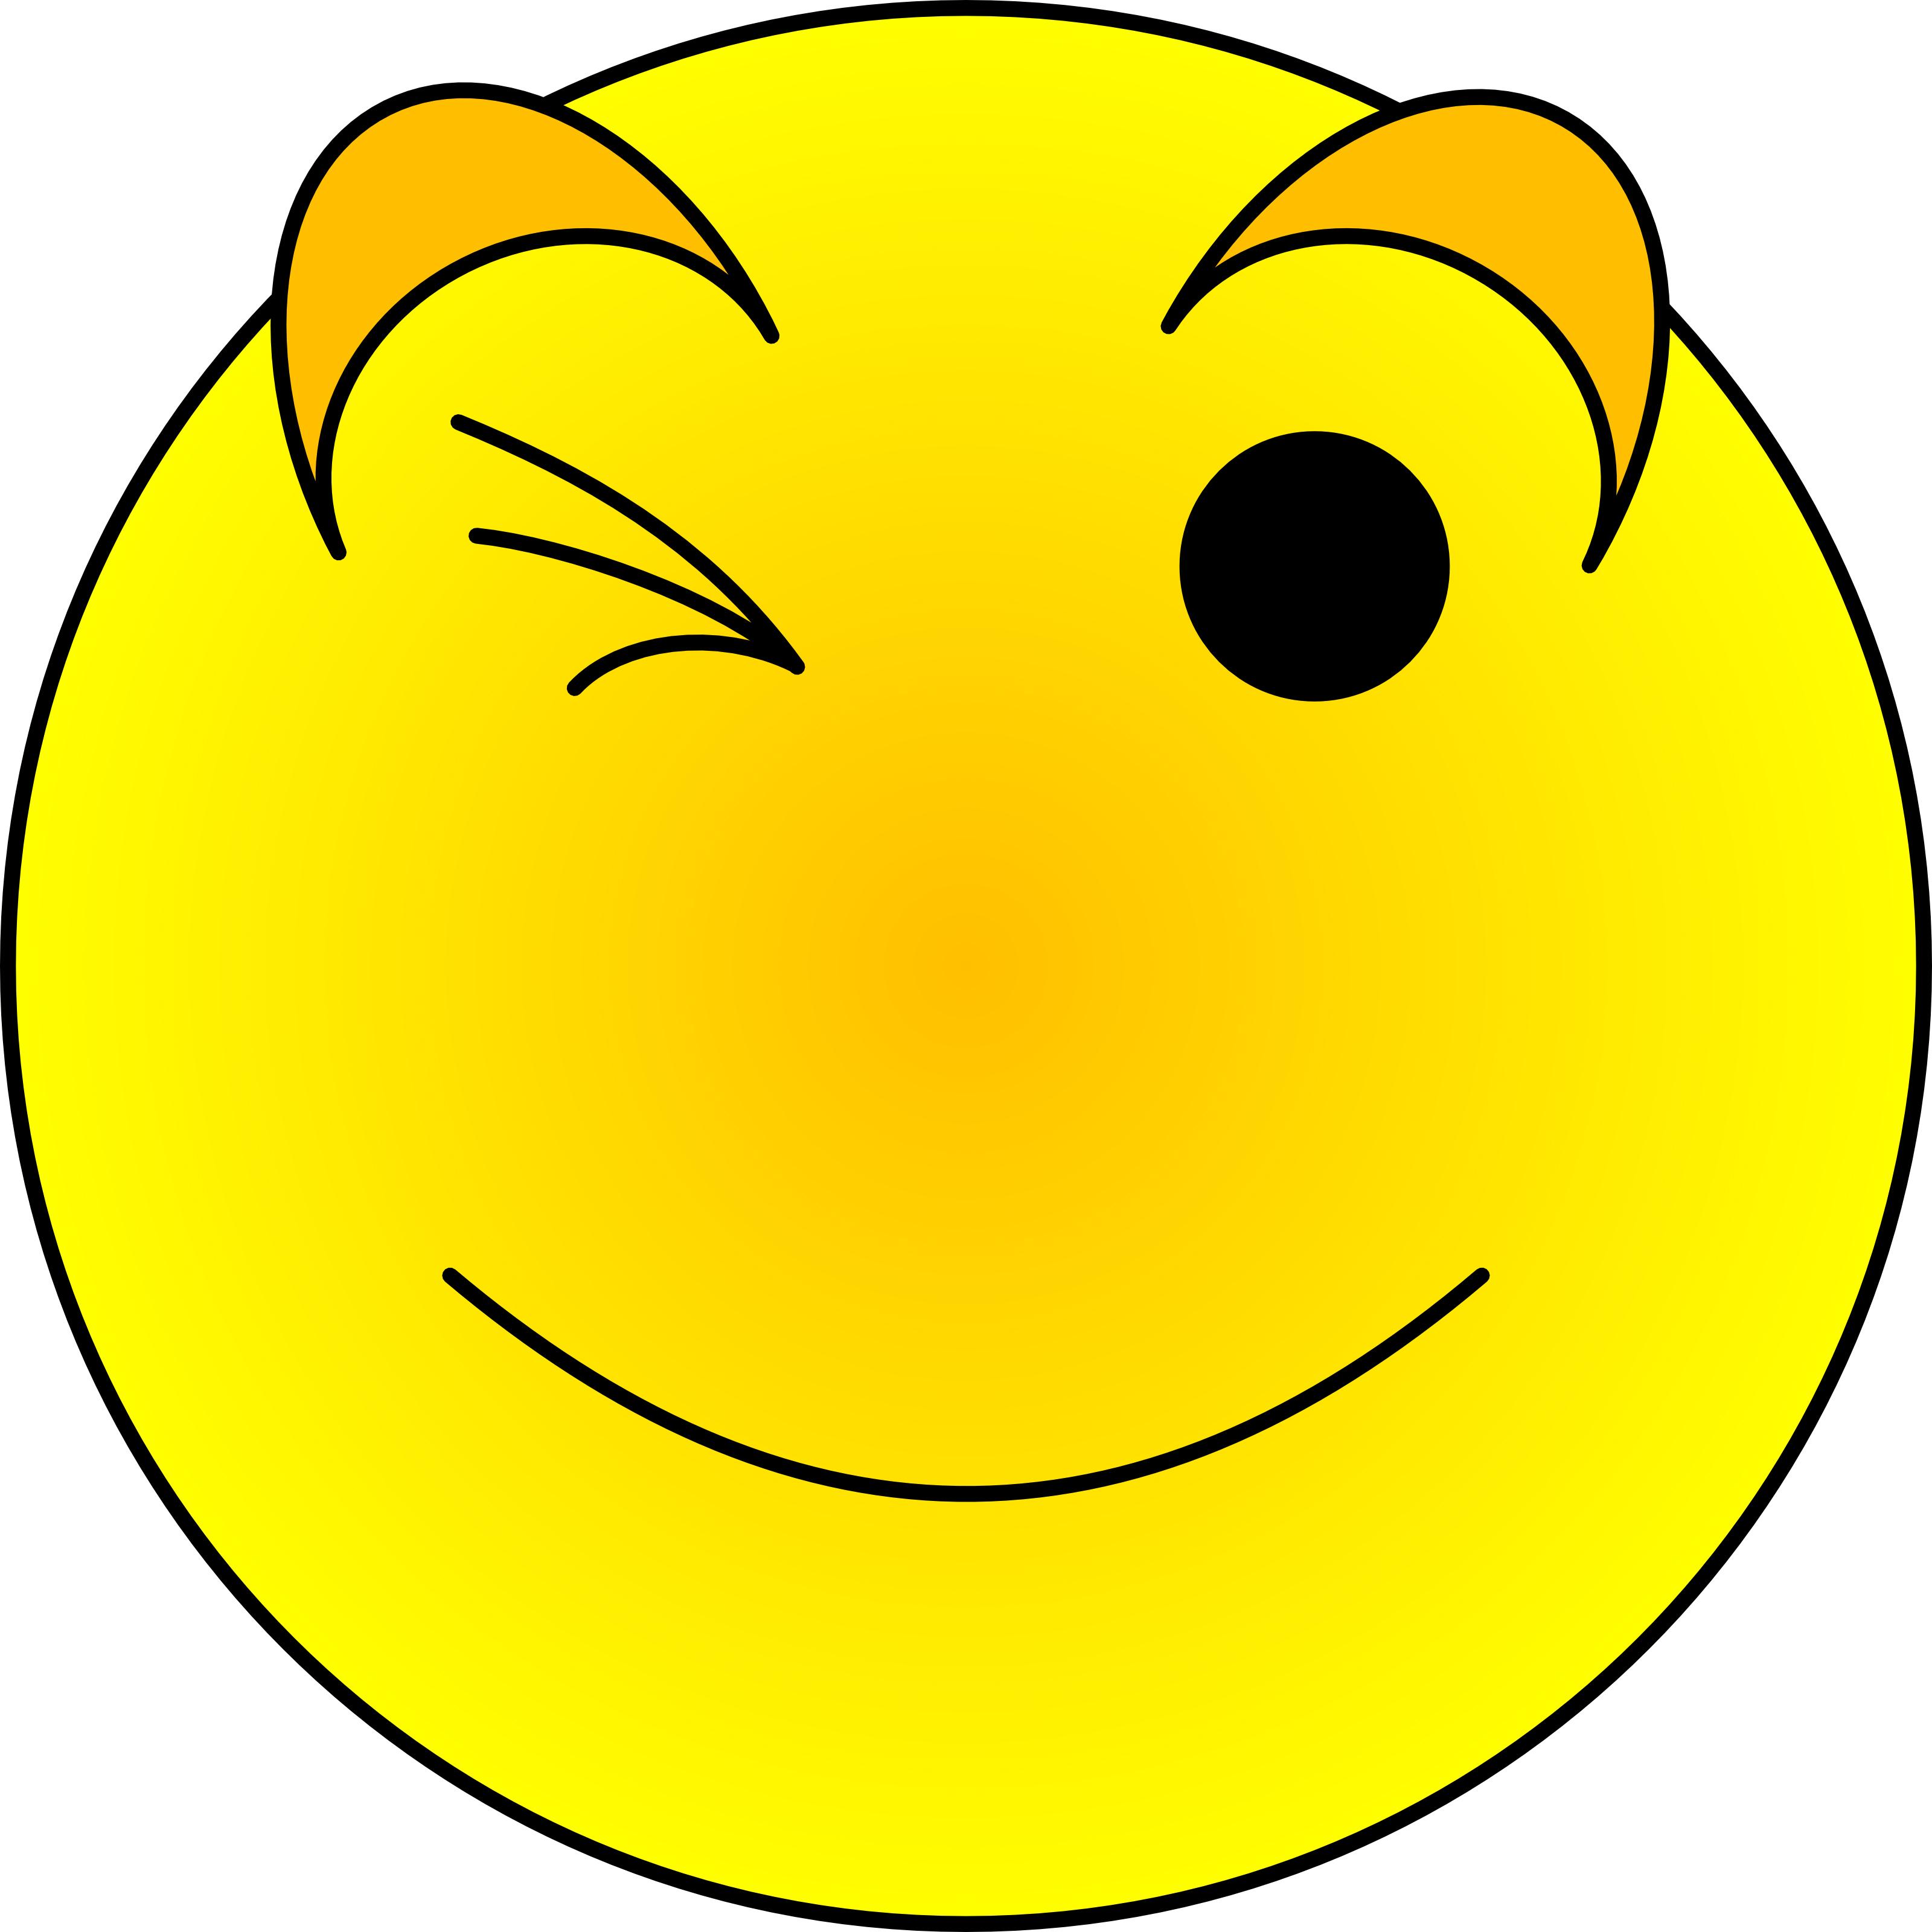 clipart smiley face - photo #22